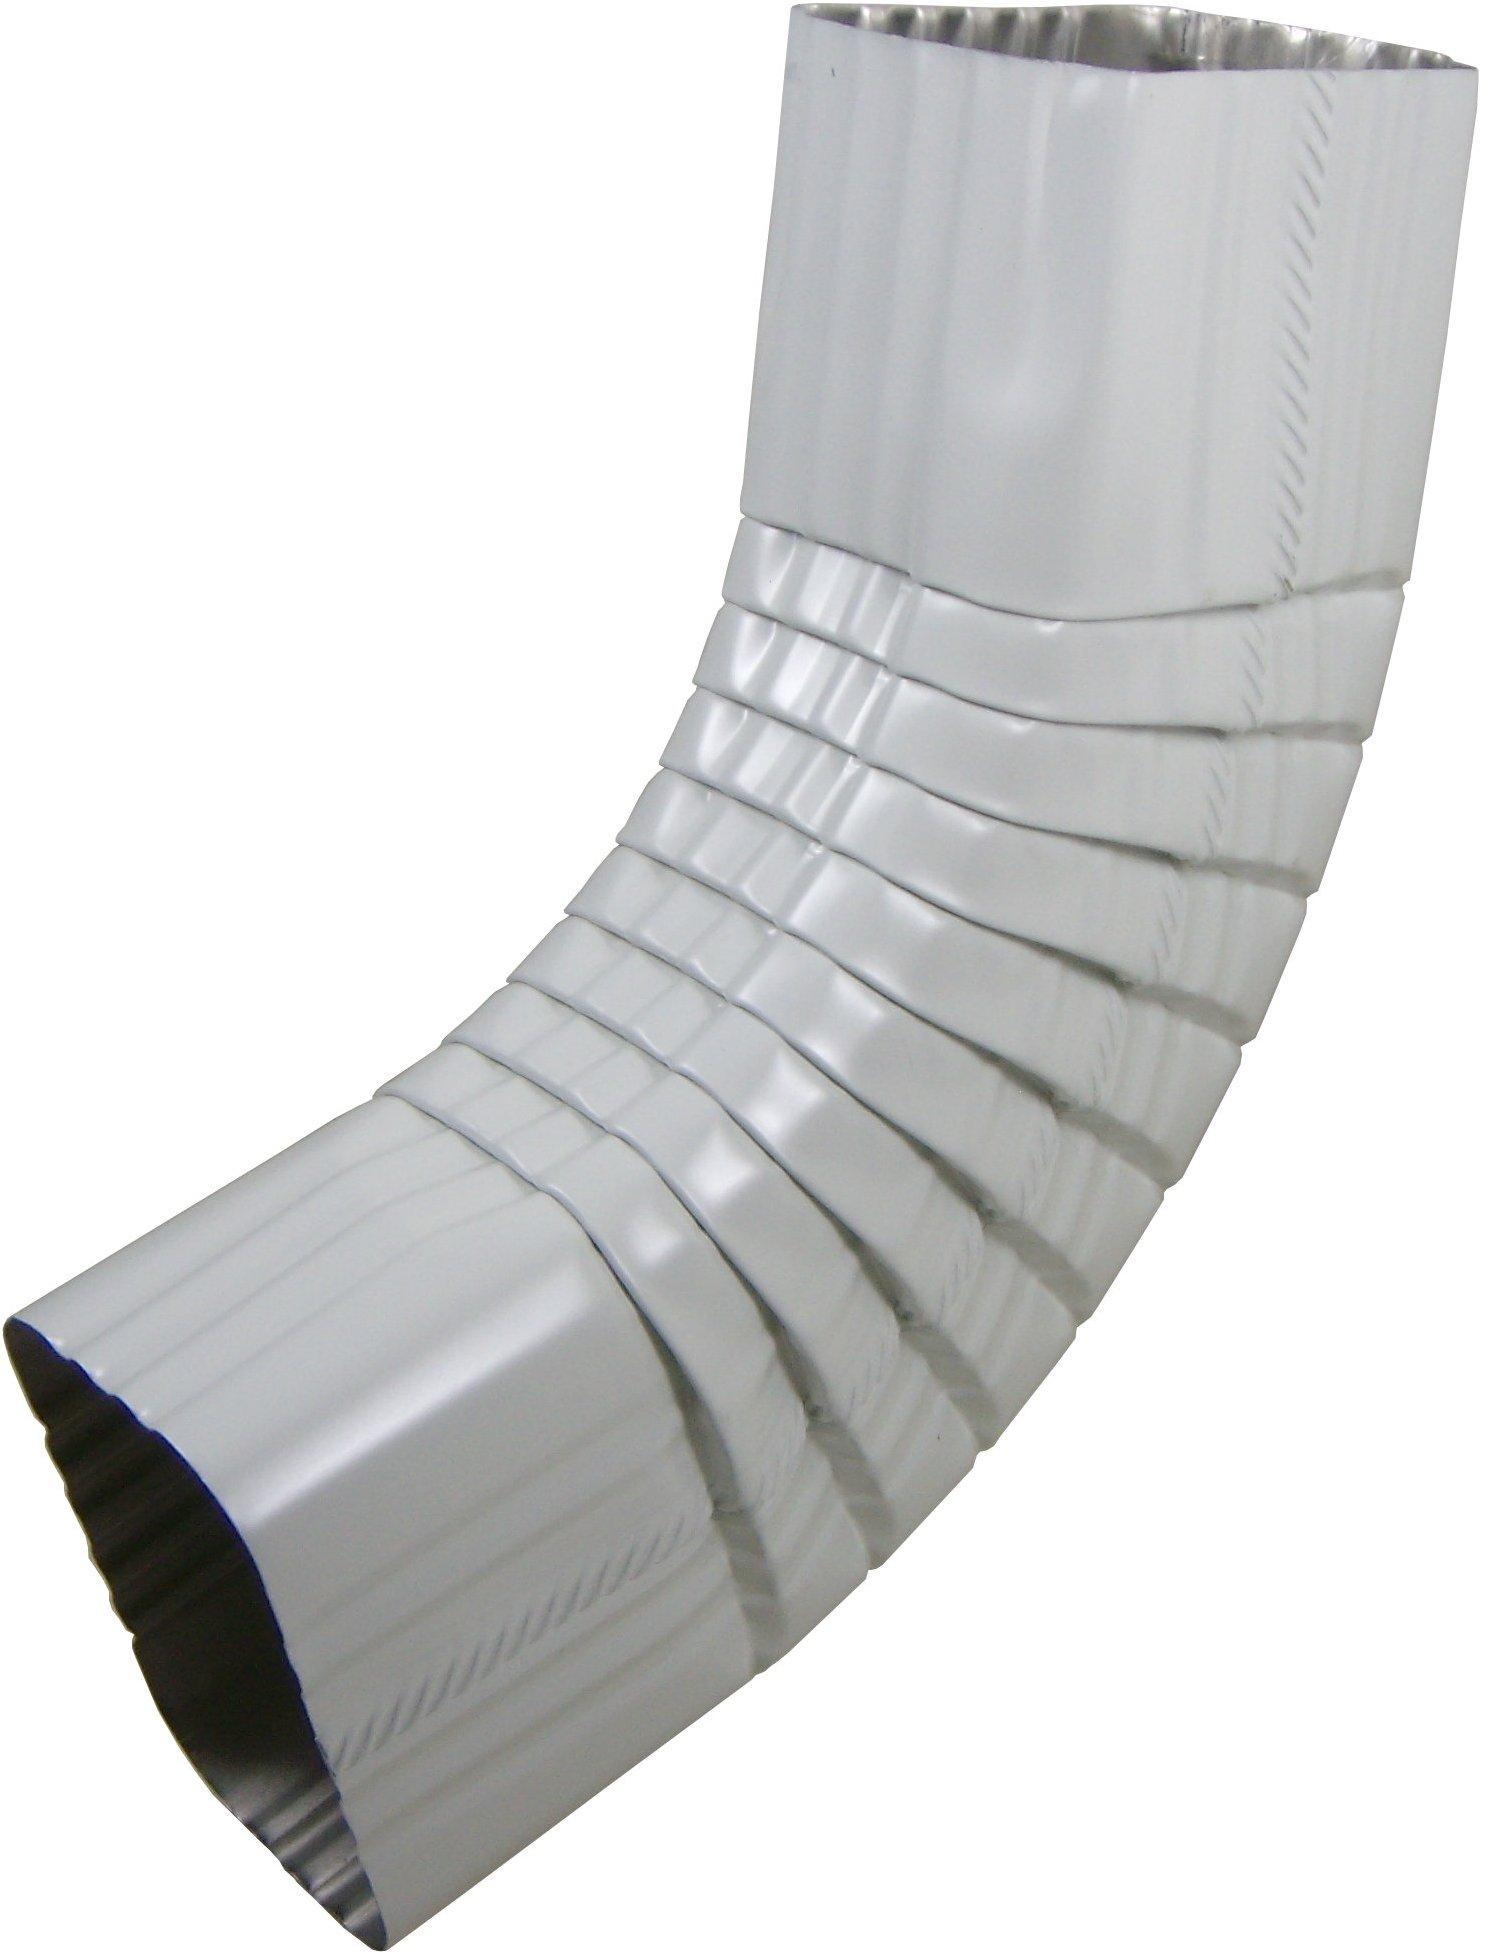 Click For A Larger View Rectangular B Aluminum Elbow